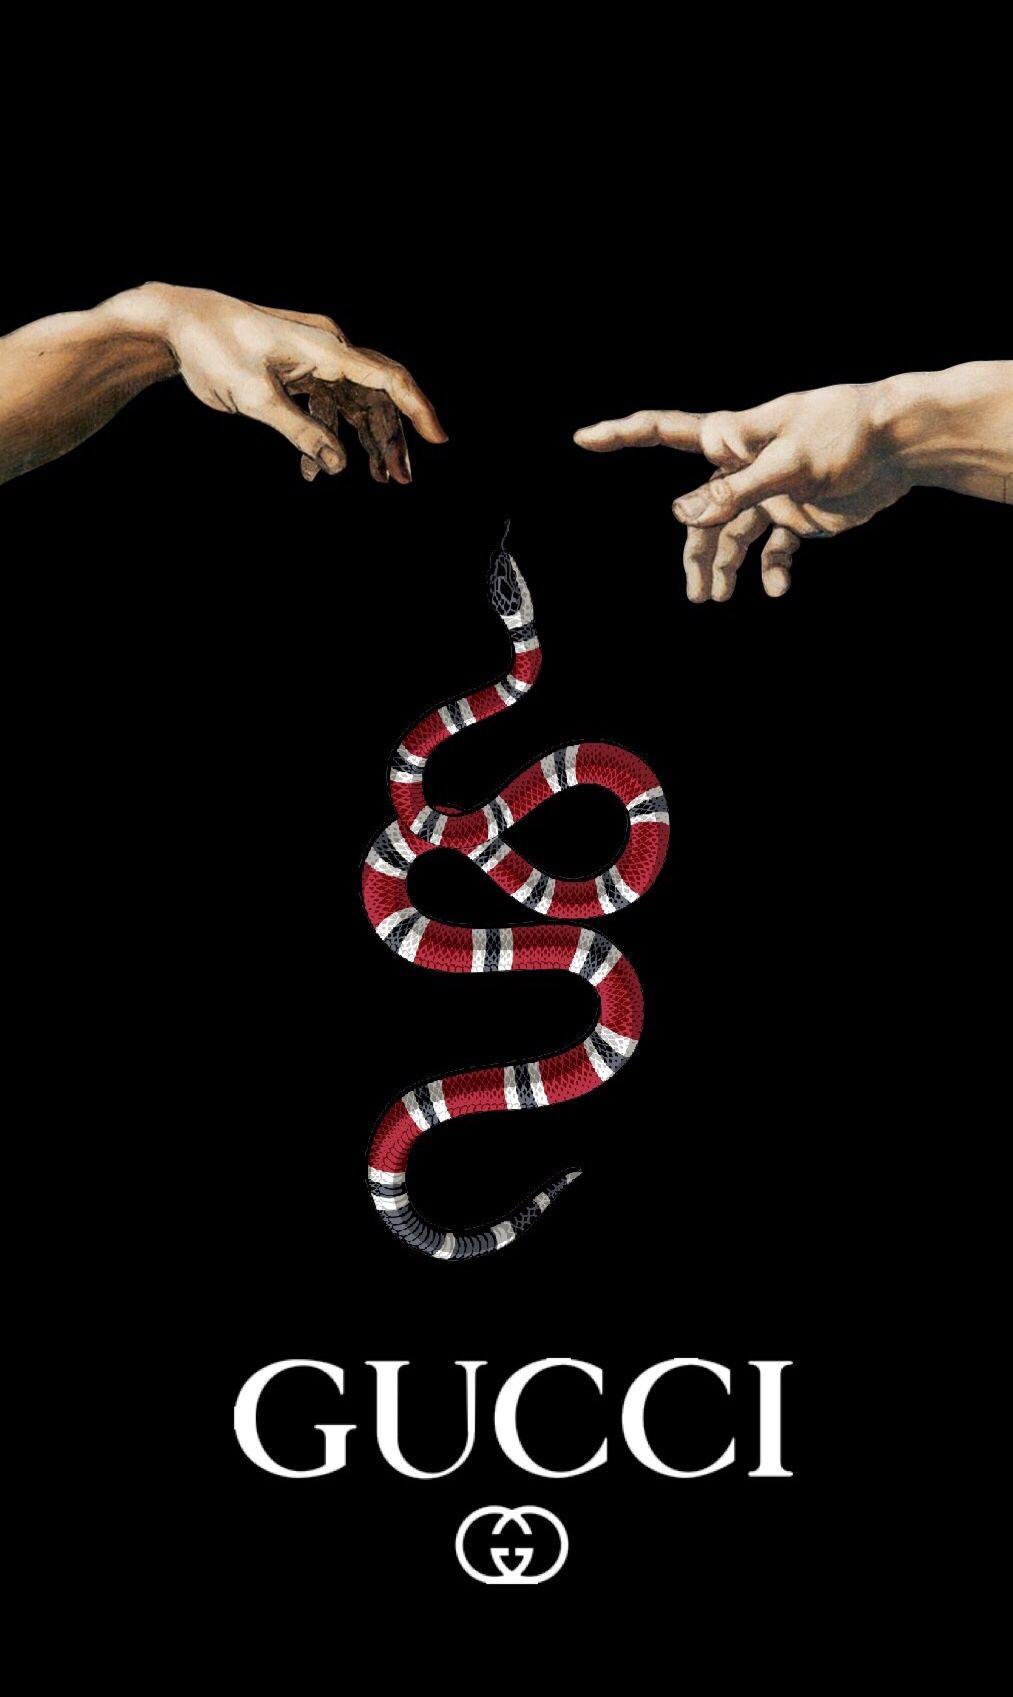 Gucci Snake Wallpaper Gucci Wallpaper Iphone Snake Wallpaper Hypebeast Wallpaper